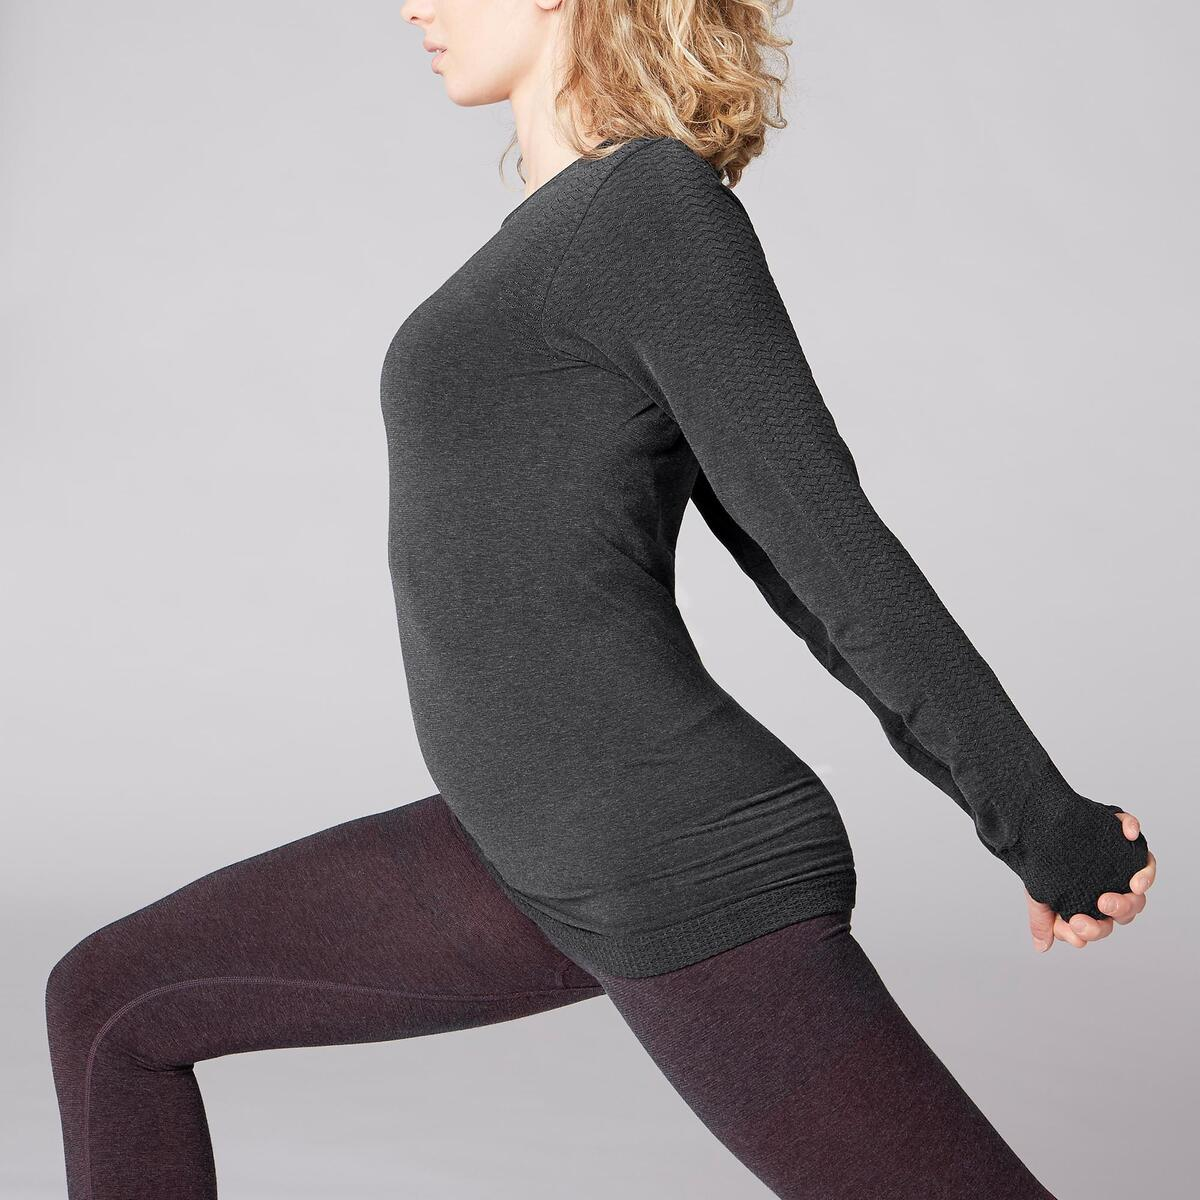 Bild 5 von Langarmshirt Yoga Damen dunkelgrau